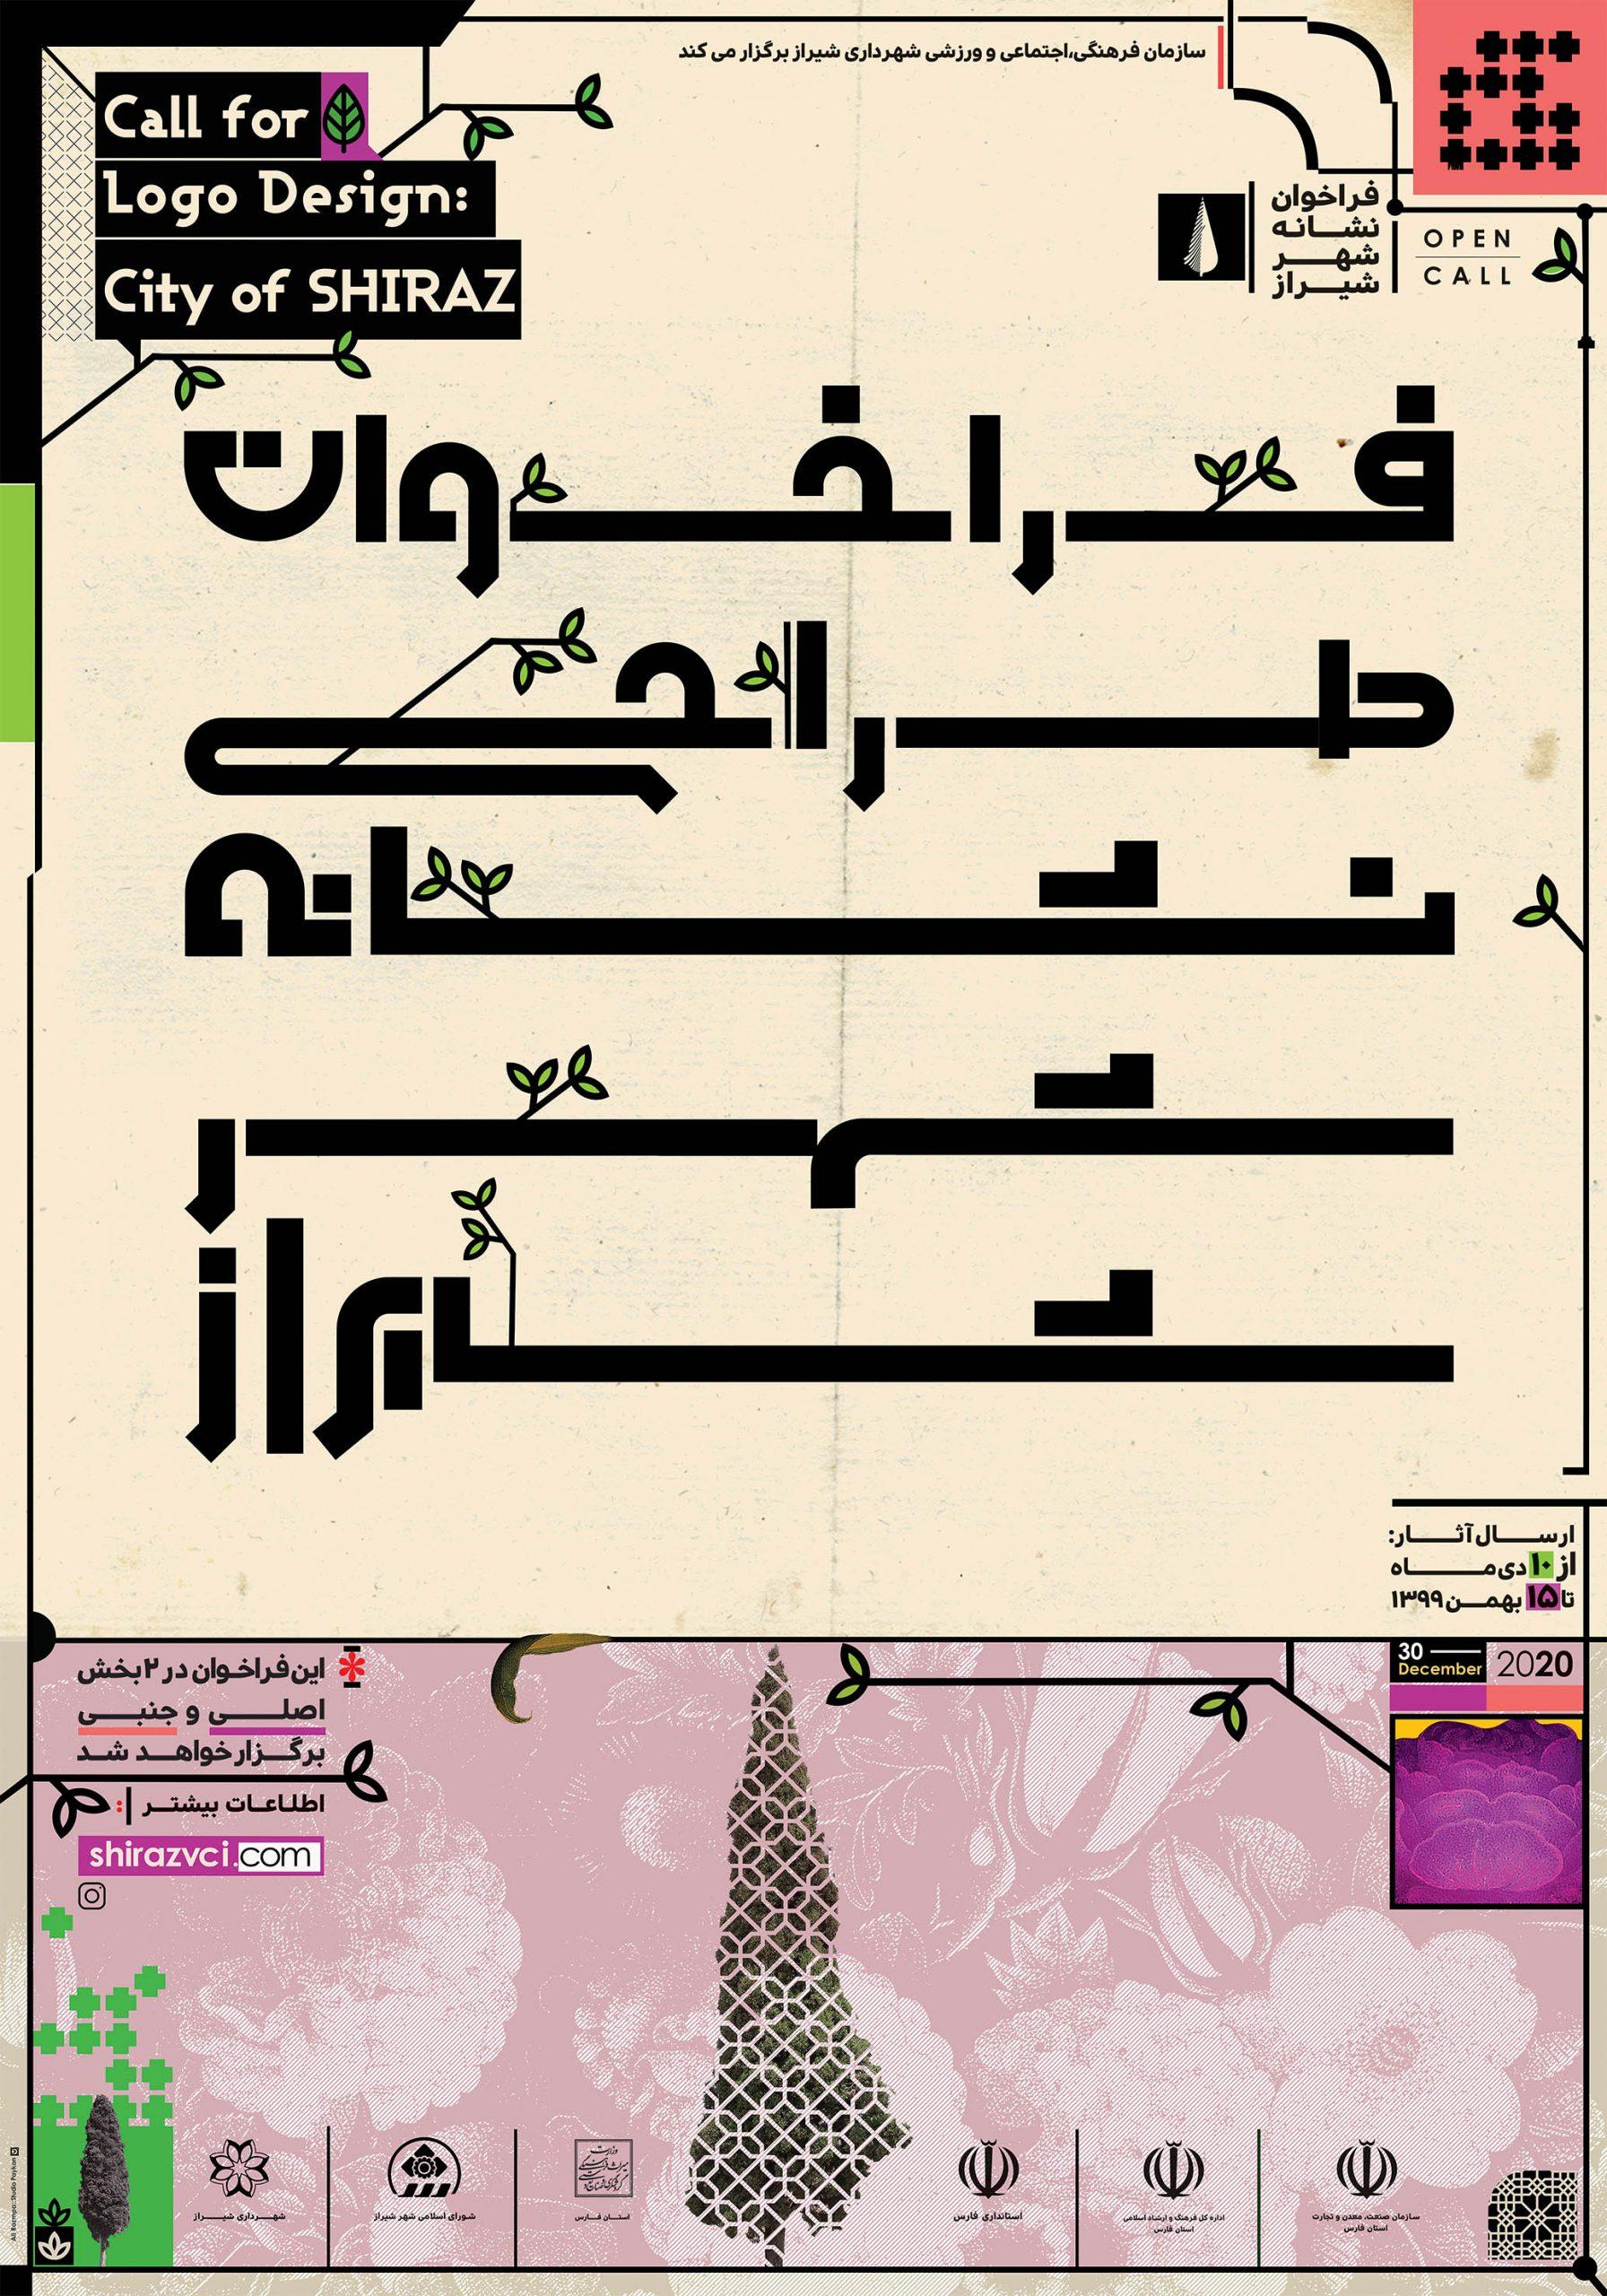 فراخوان طراحی نشانه شهر شیراز لینک : https://asarartmagazine.ir/?p=22523👇 سایت : AsarArtMagazine.ir اینستاگرام : instagram.com/AsarArtMagazine تلگرام :  t.me/AsarArtMagazine 👆